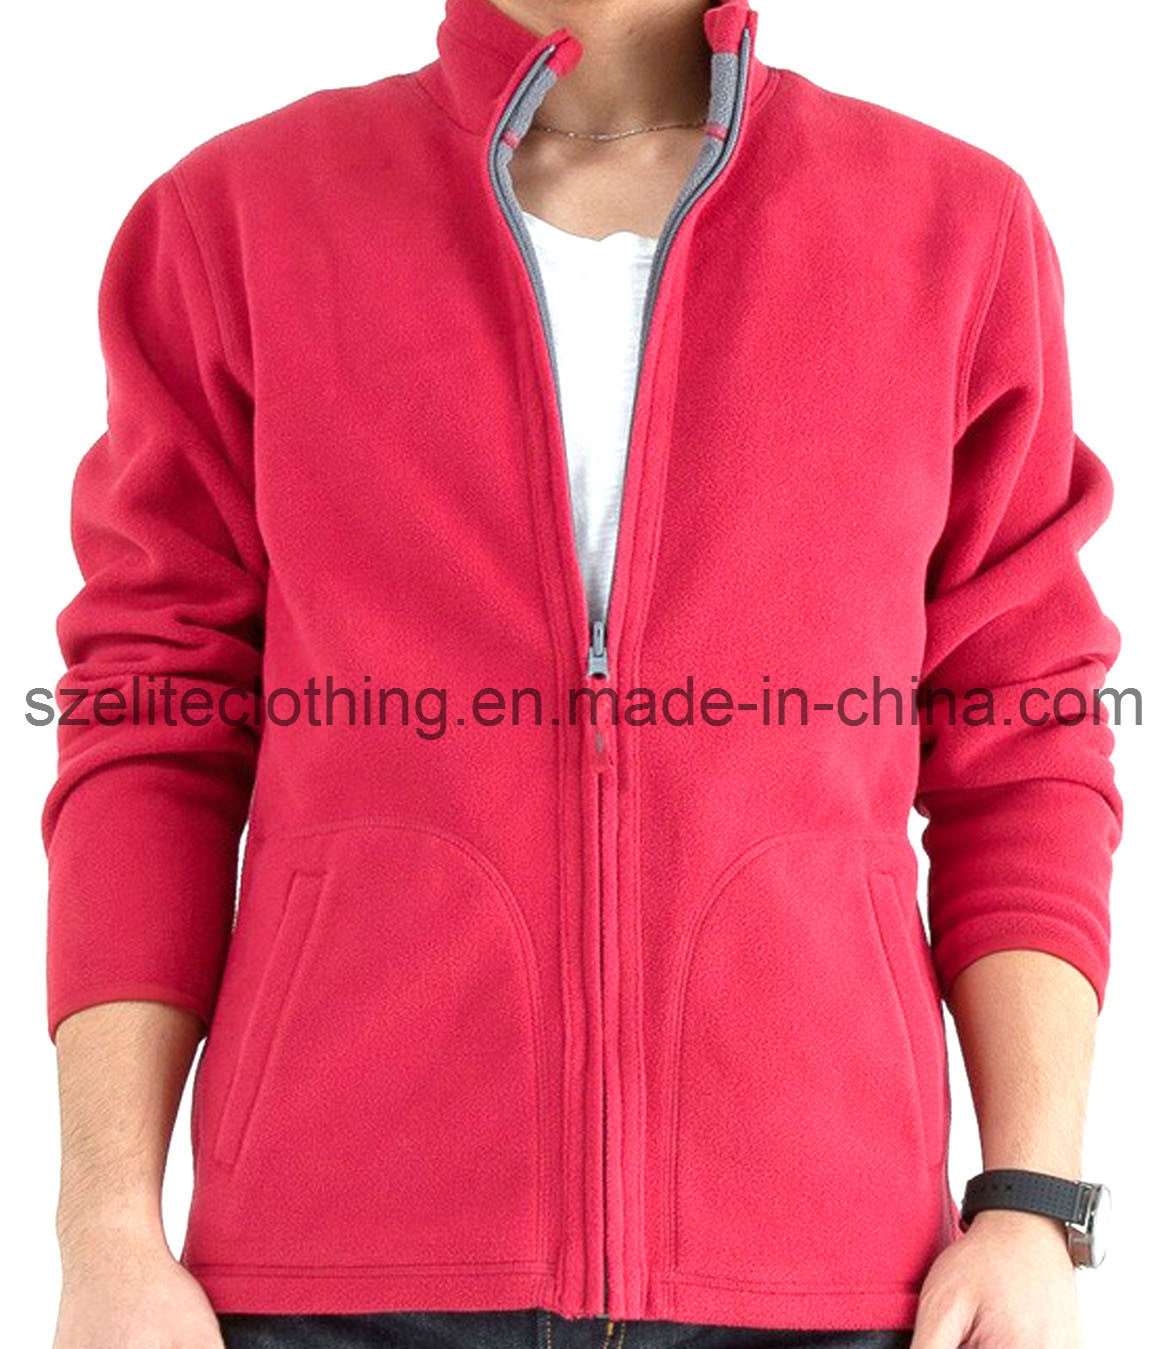 Promotional Thick Jacket Polar Fleece (ELTWJJ-13)